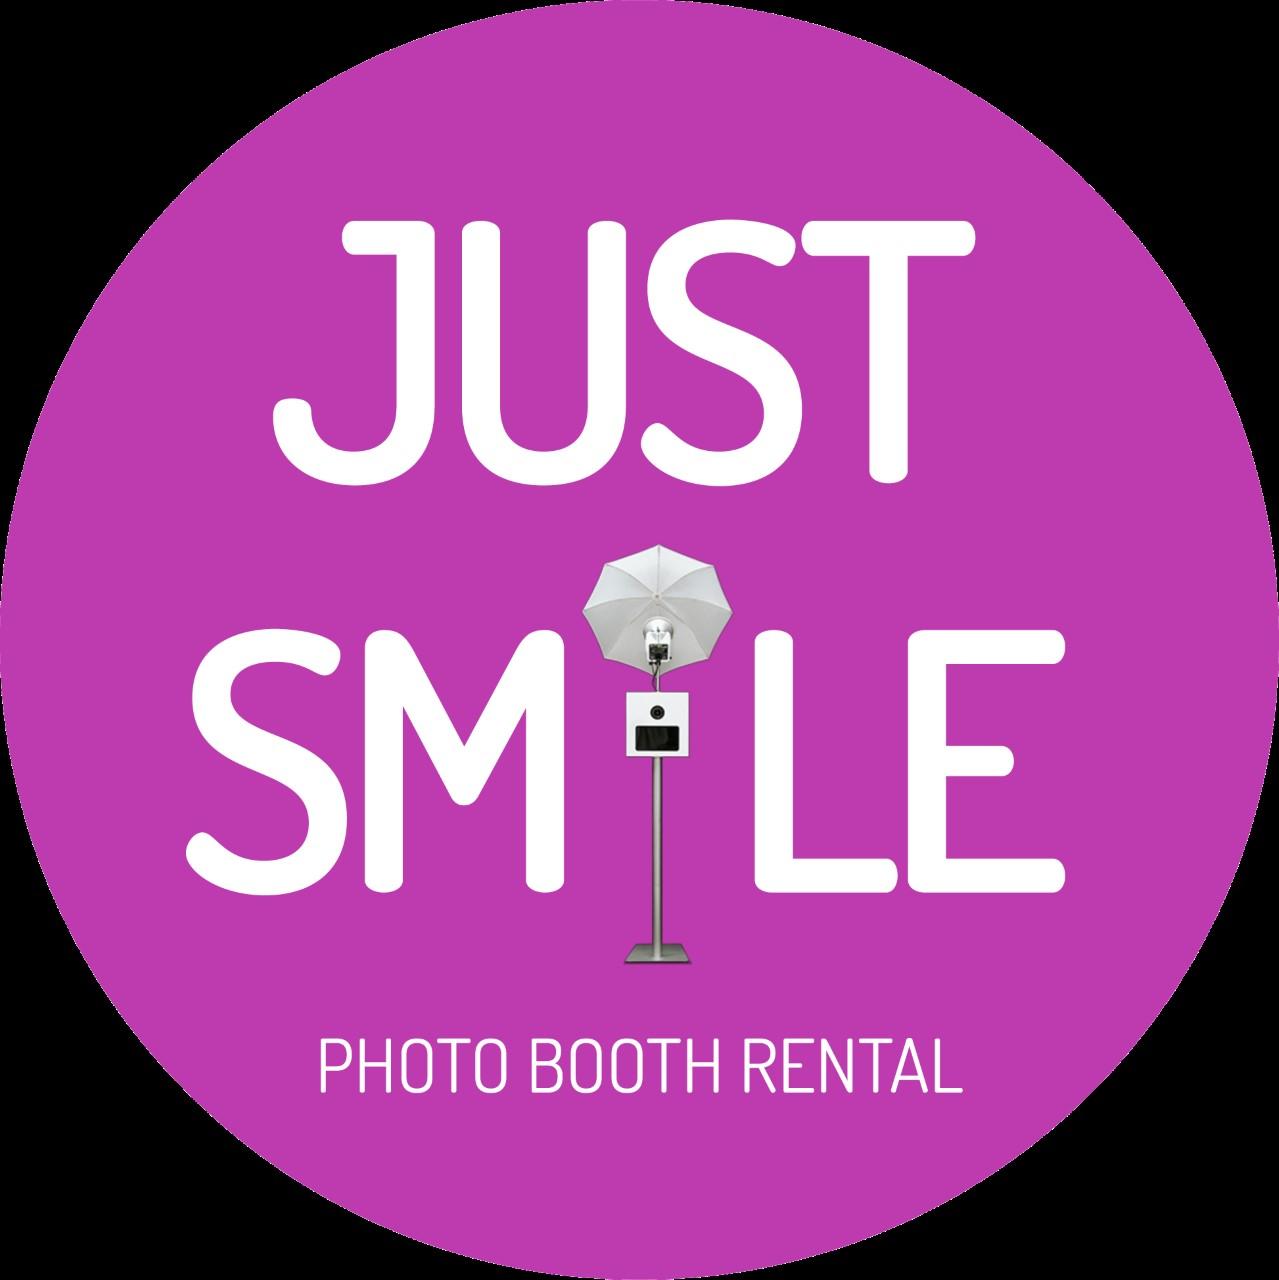 thumbnail_JS Booth Marketing logo large (PNG) copy.jpg